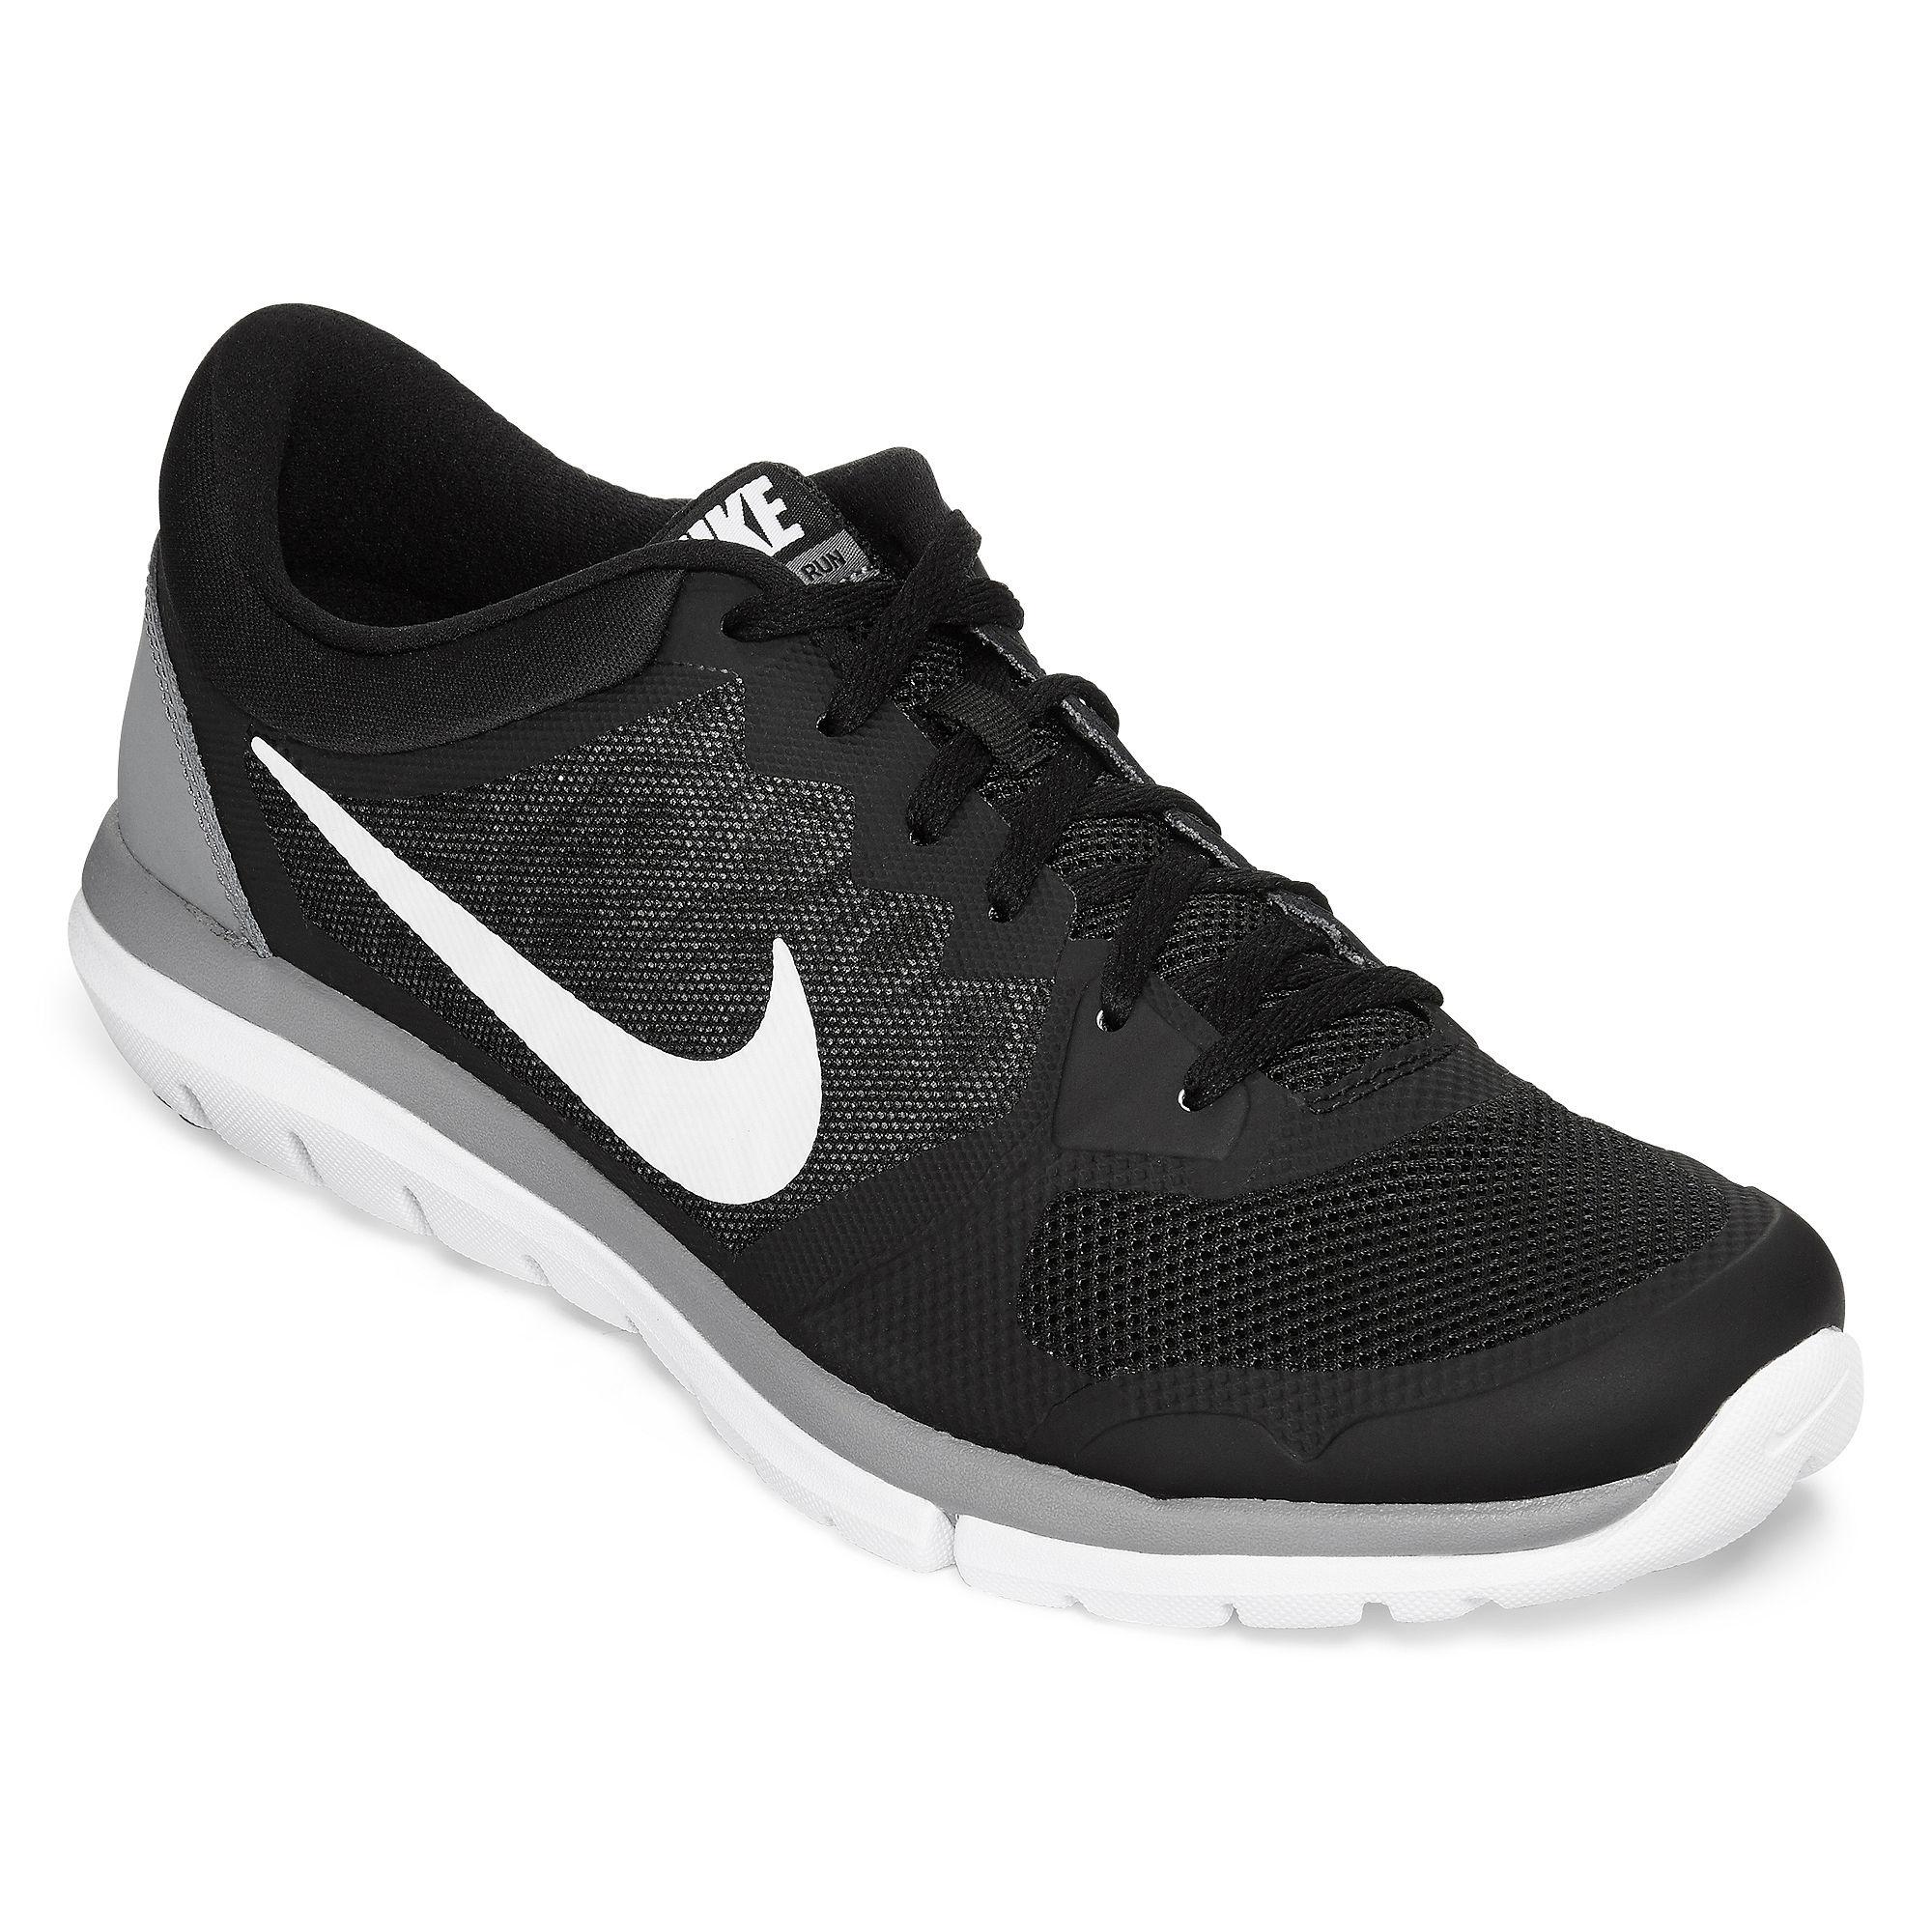 low priced 41d3d 26cb7 ... Nike Flex Run 2015 Mens Running Shoes. UPC 888408731609